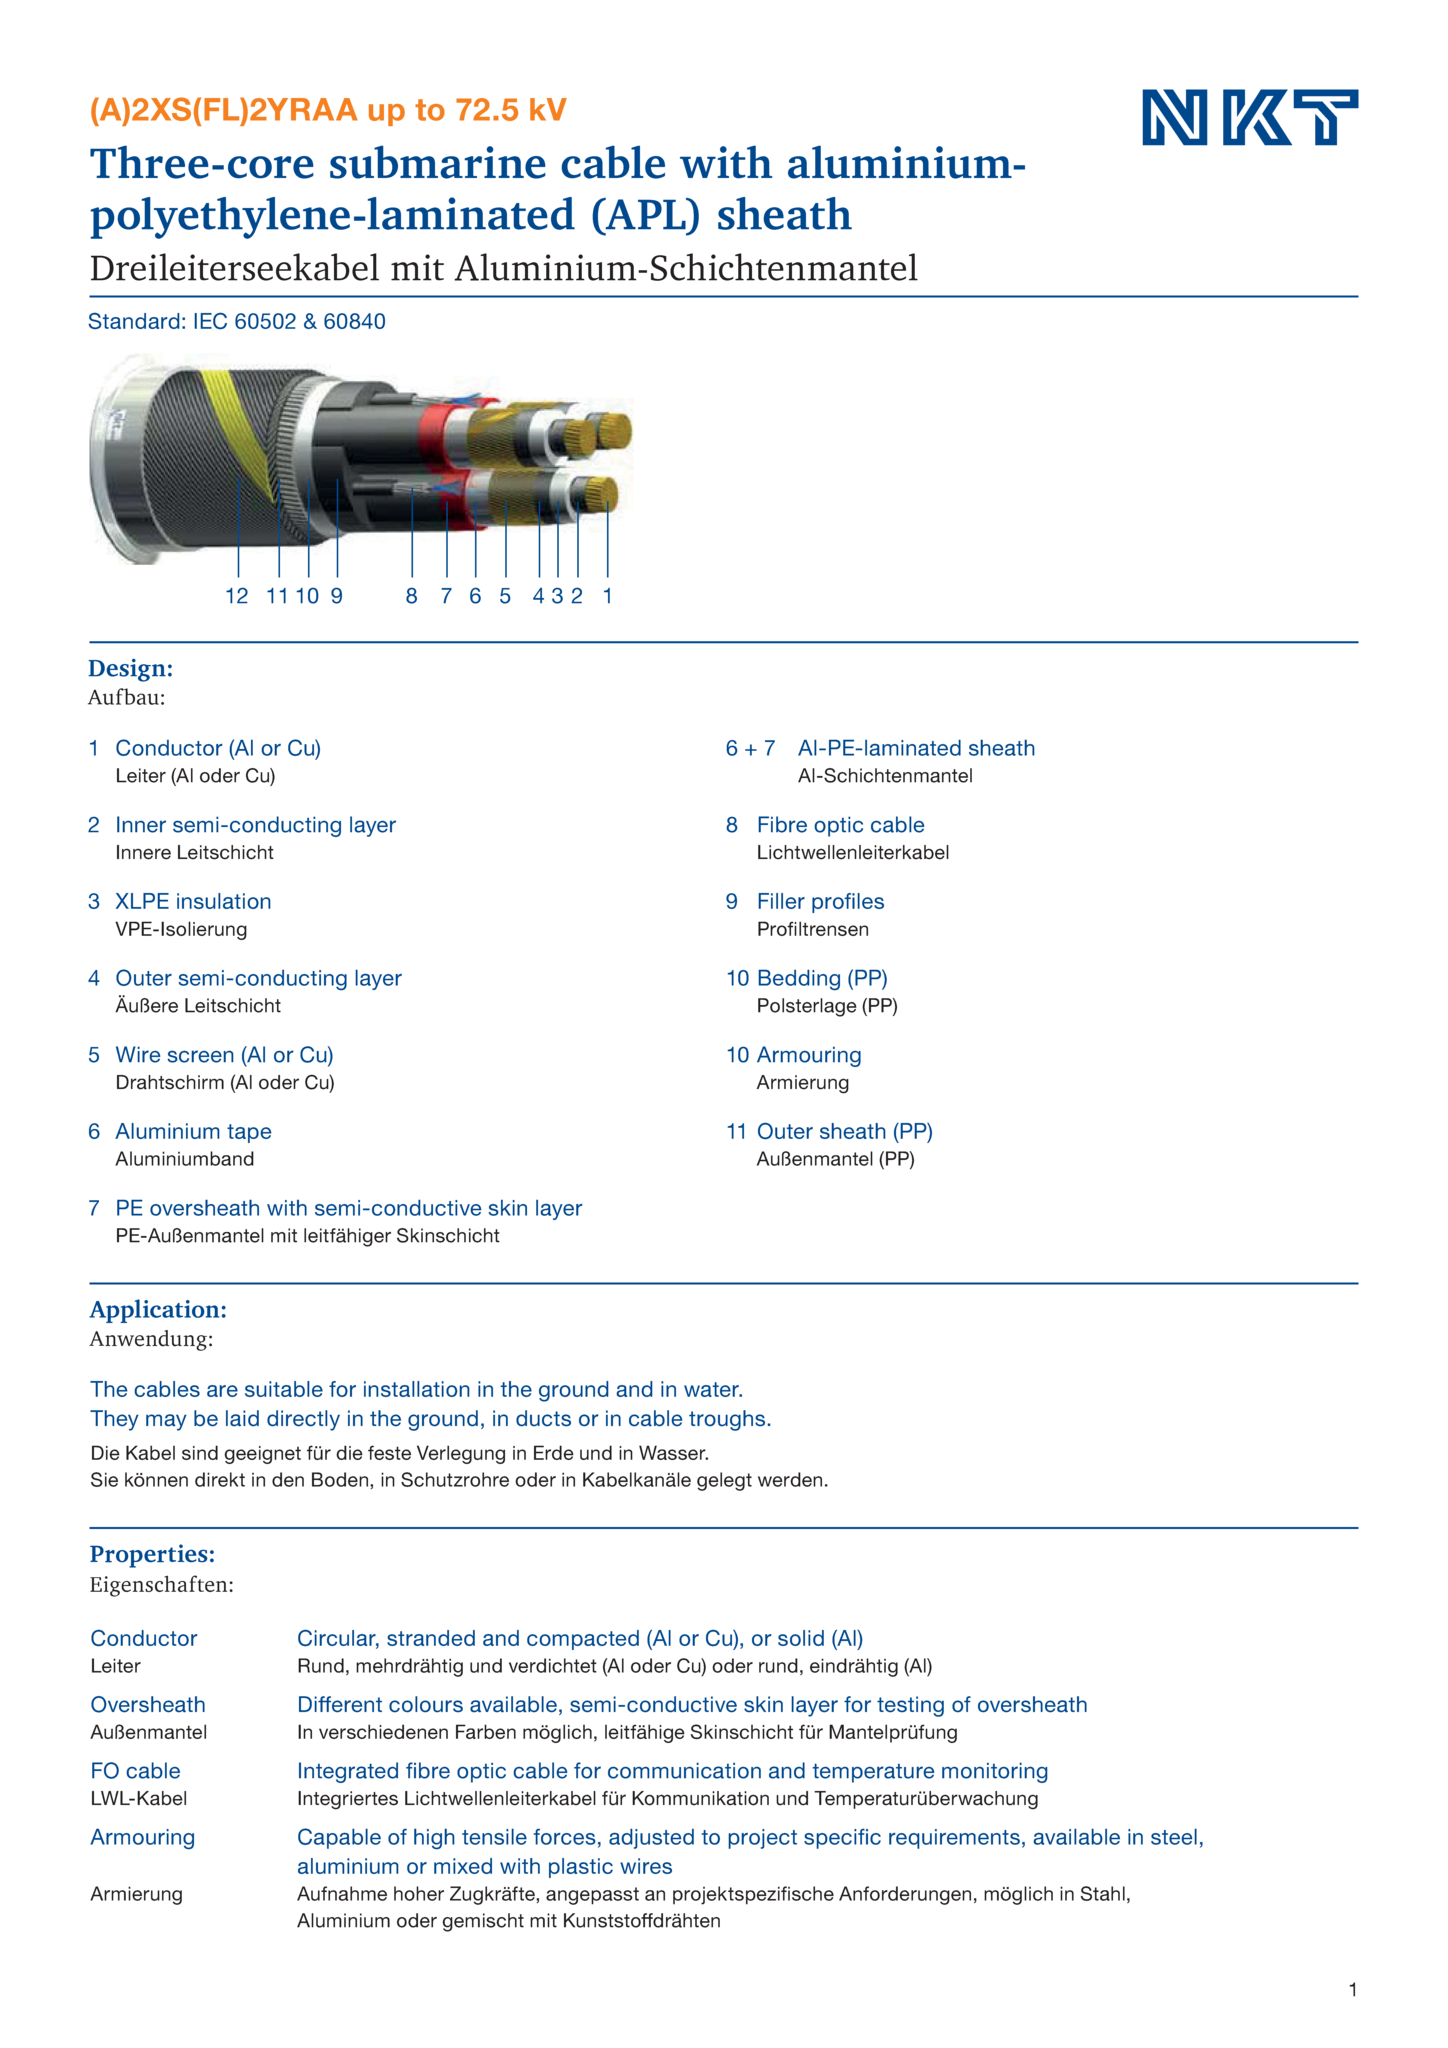 _A_2XS_FL_2YRAA_up_to_72.5_kV_DS_DE_EN.pdf